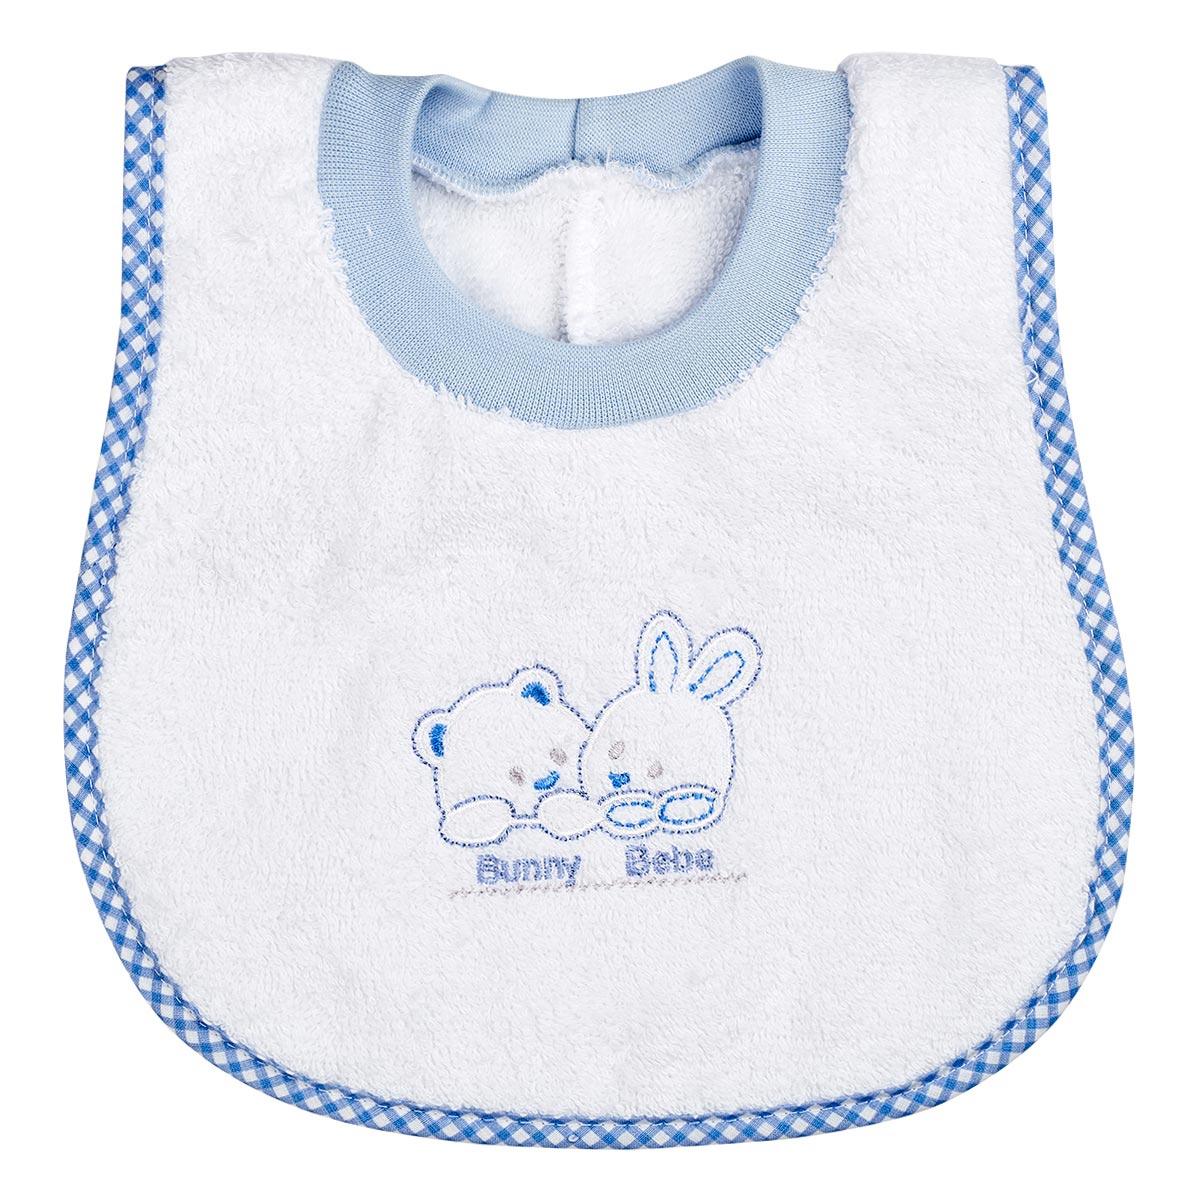 "Bunny bebe σαλιάρα πετσετέ ""ποδίτσα"" αρκουδάκια μπλέ"